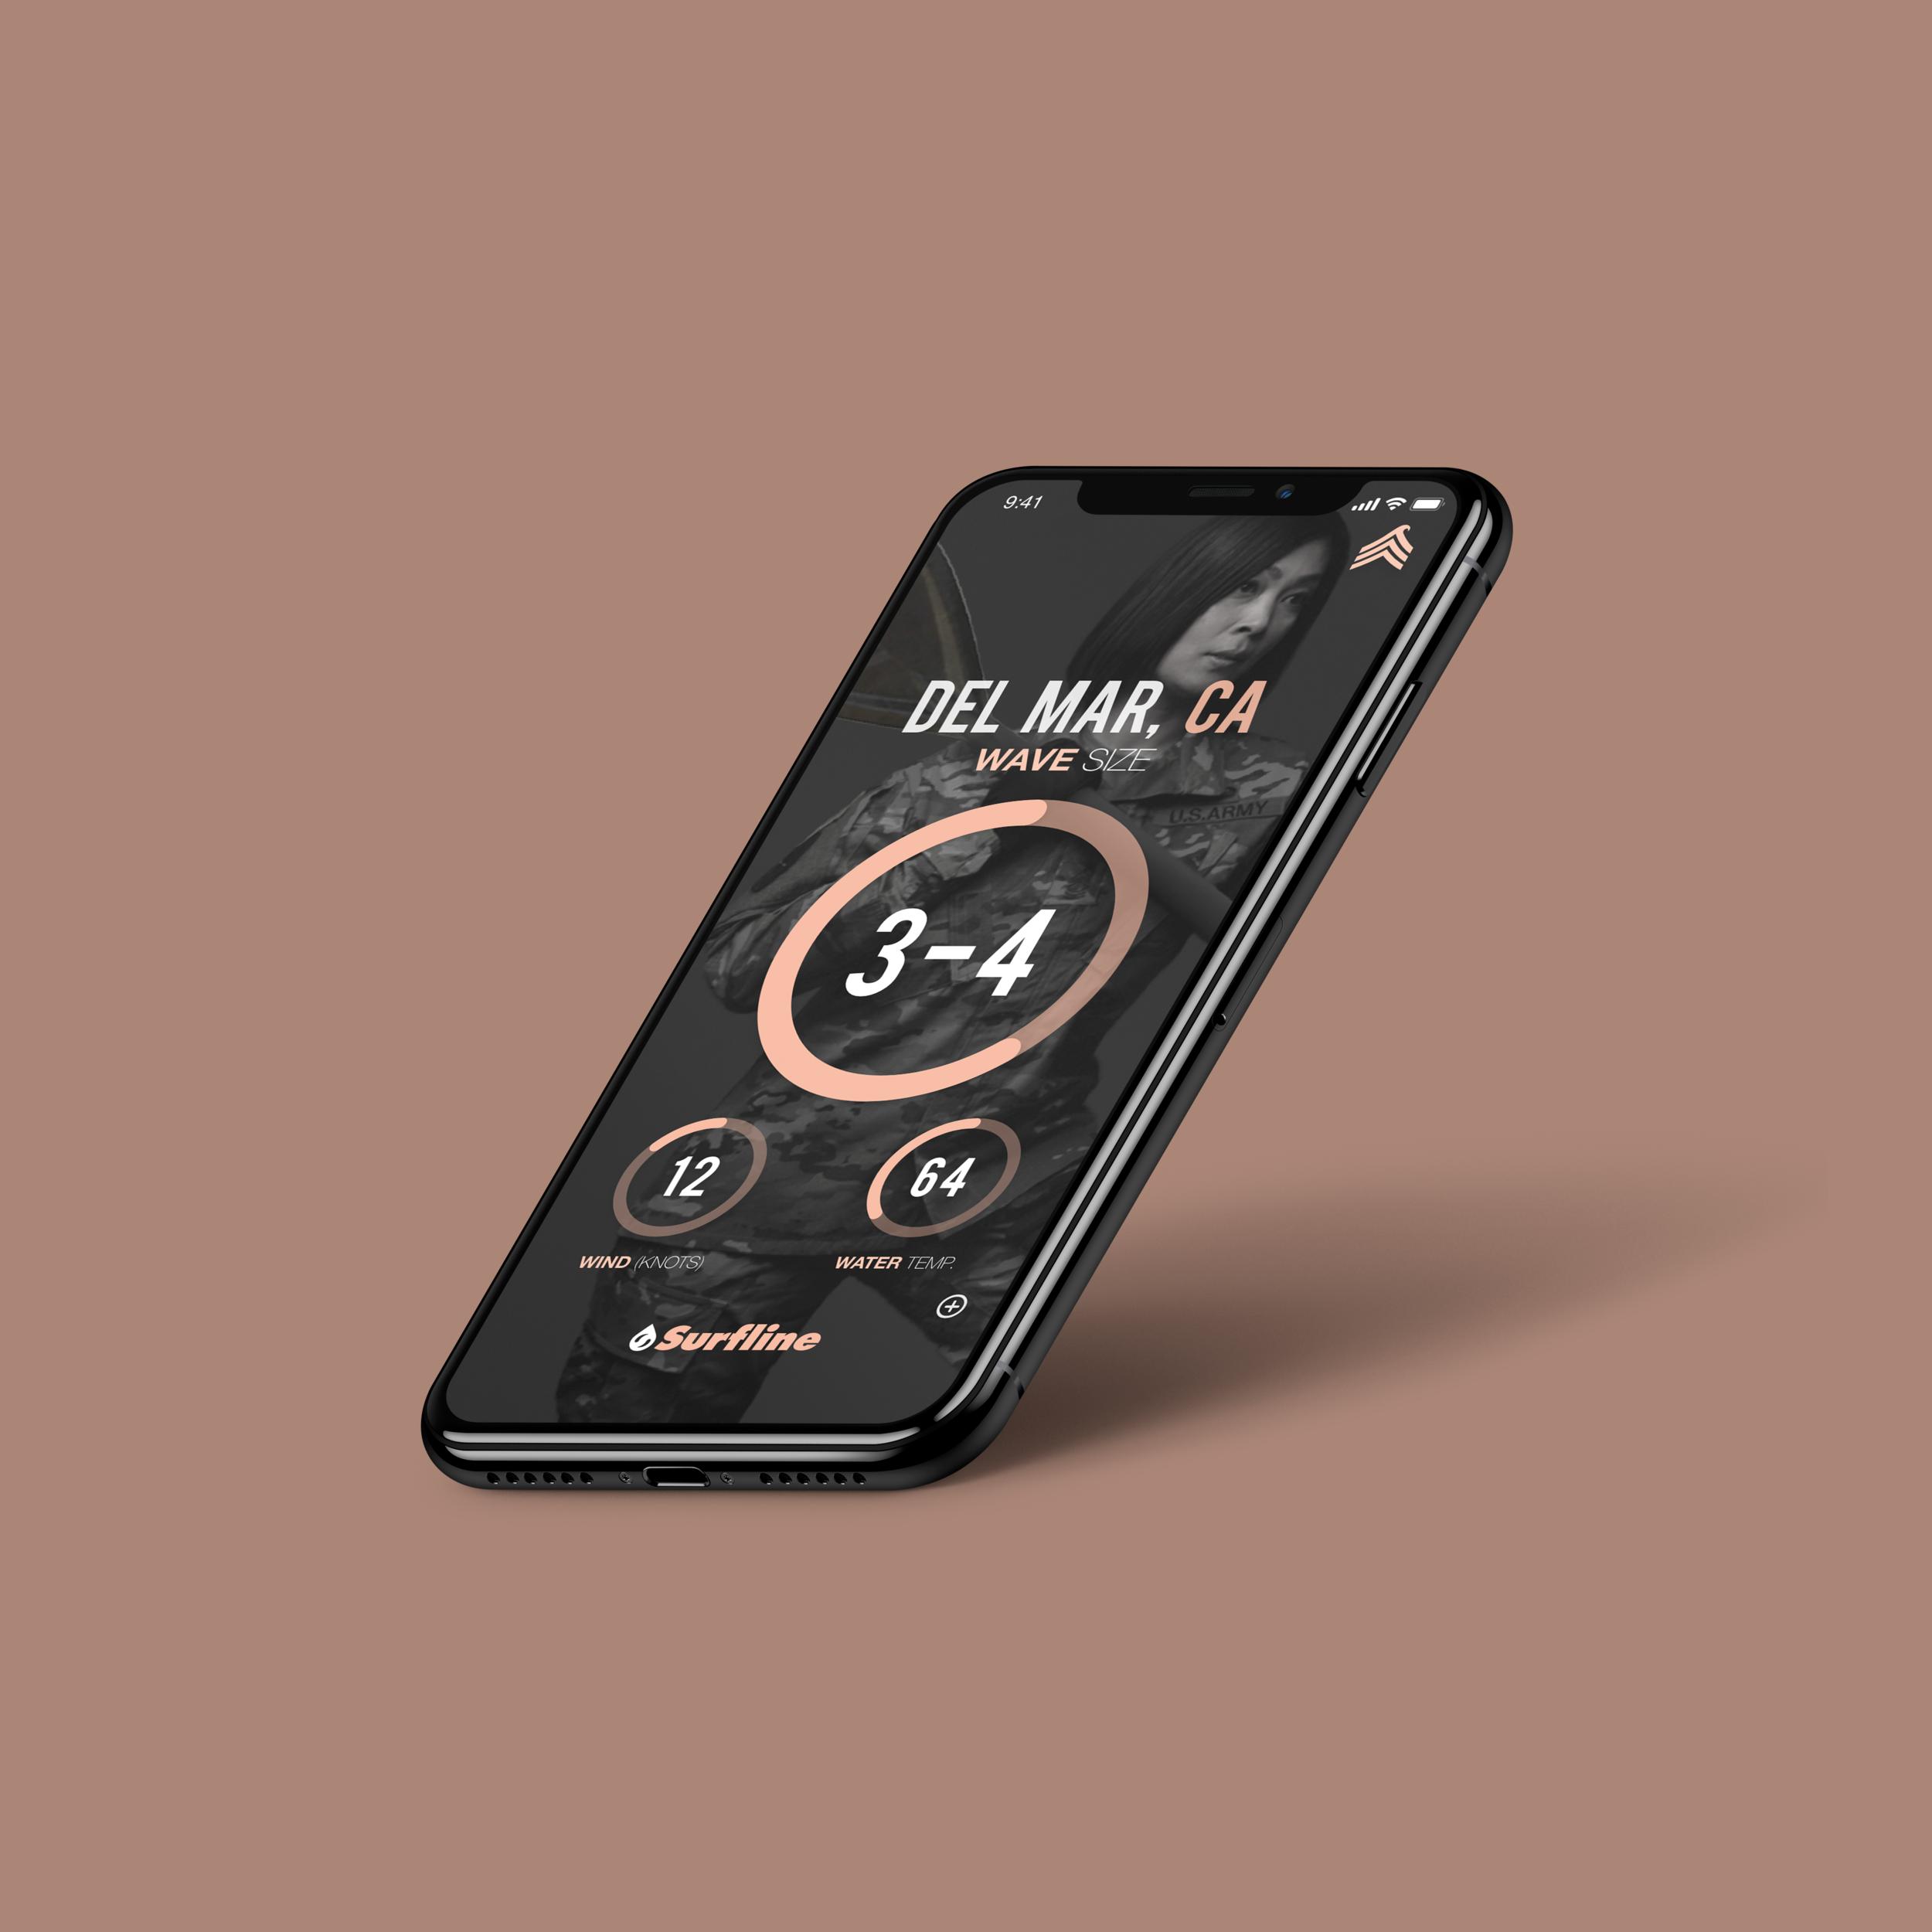 OA iphone mock 1.png